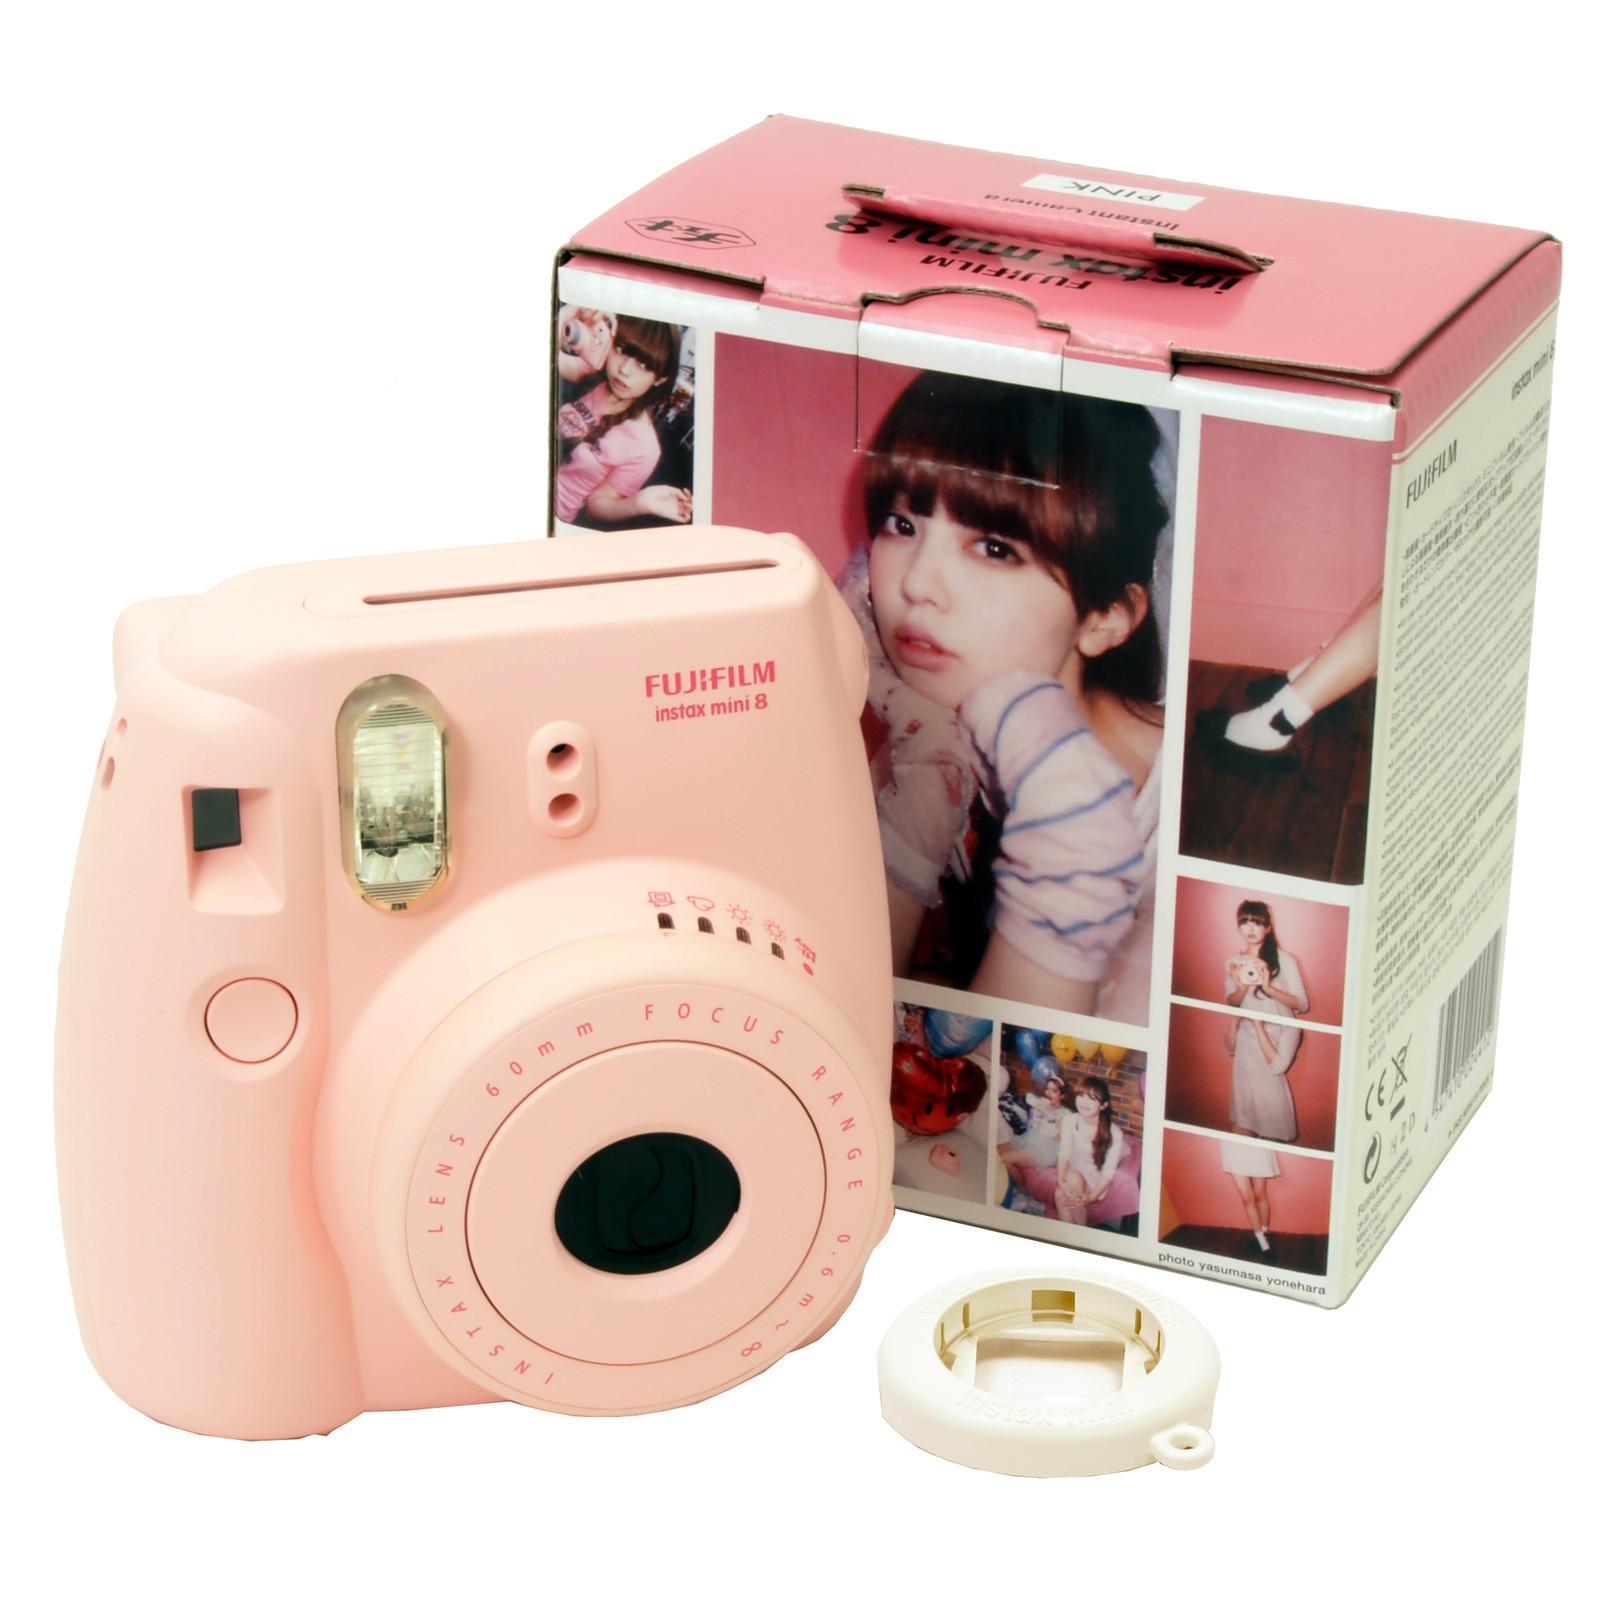 Fujifilm instax mini polaroid camera / Diario de greg 5